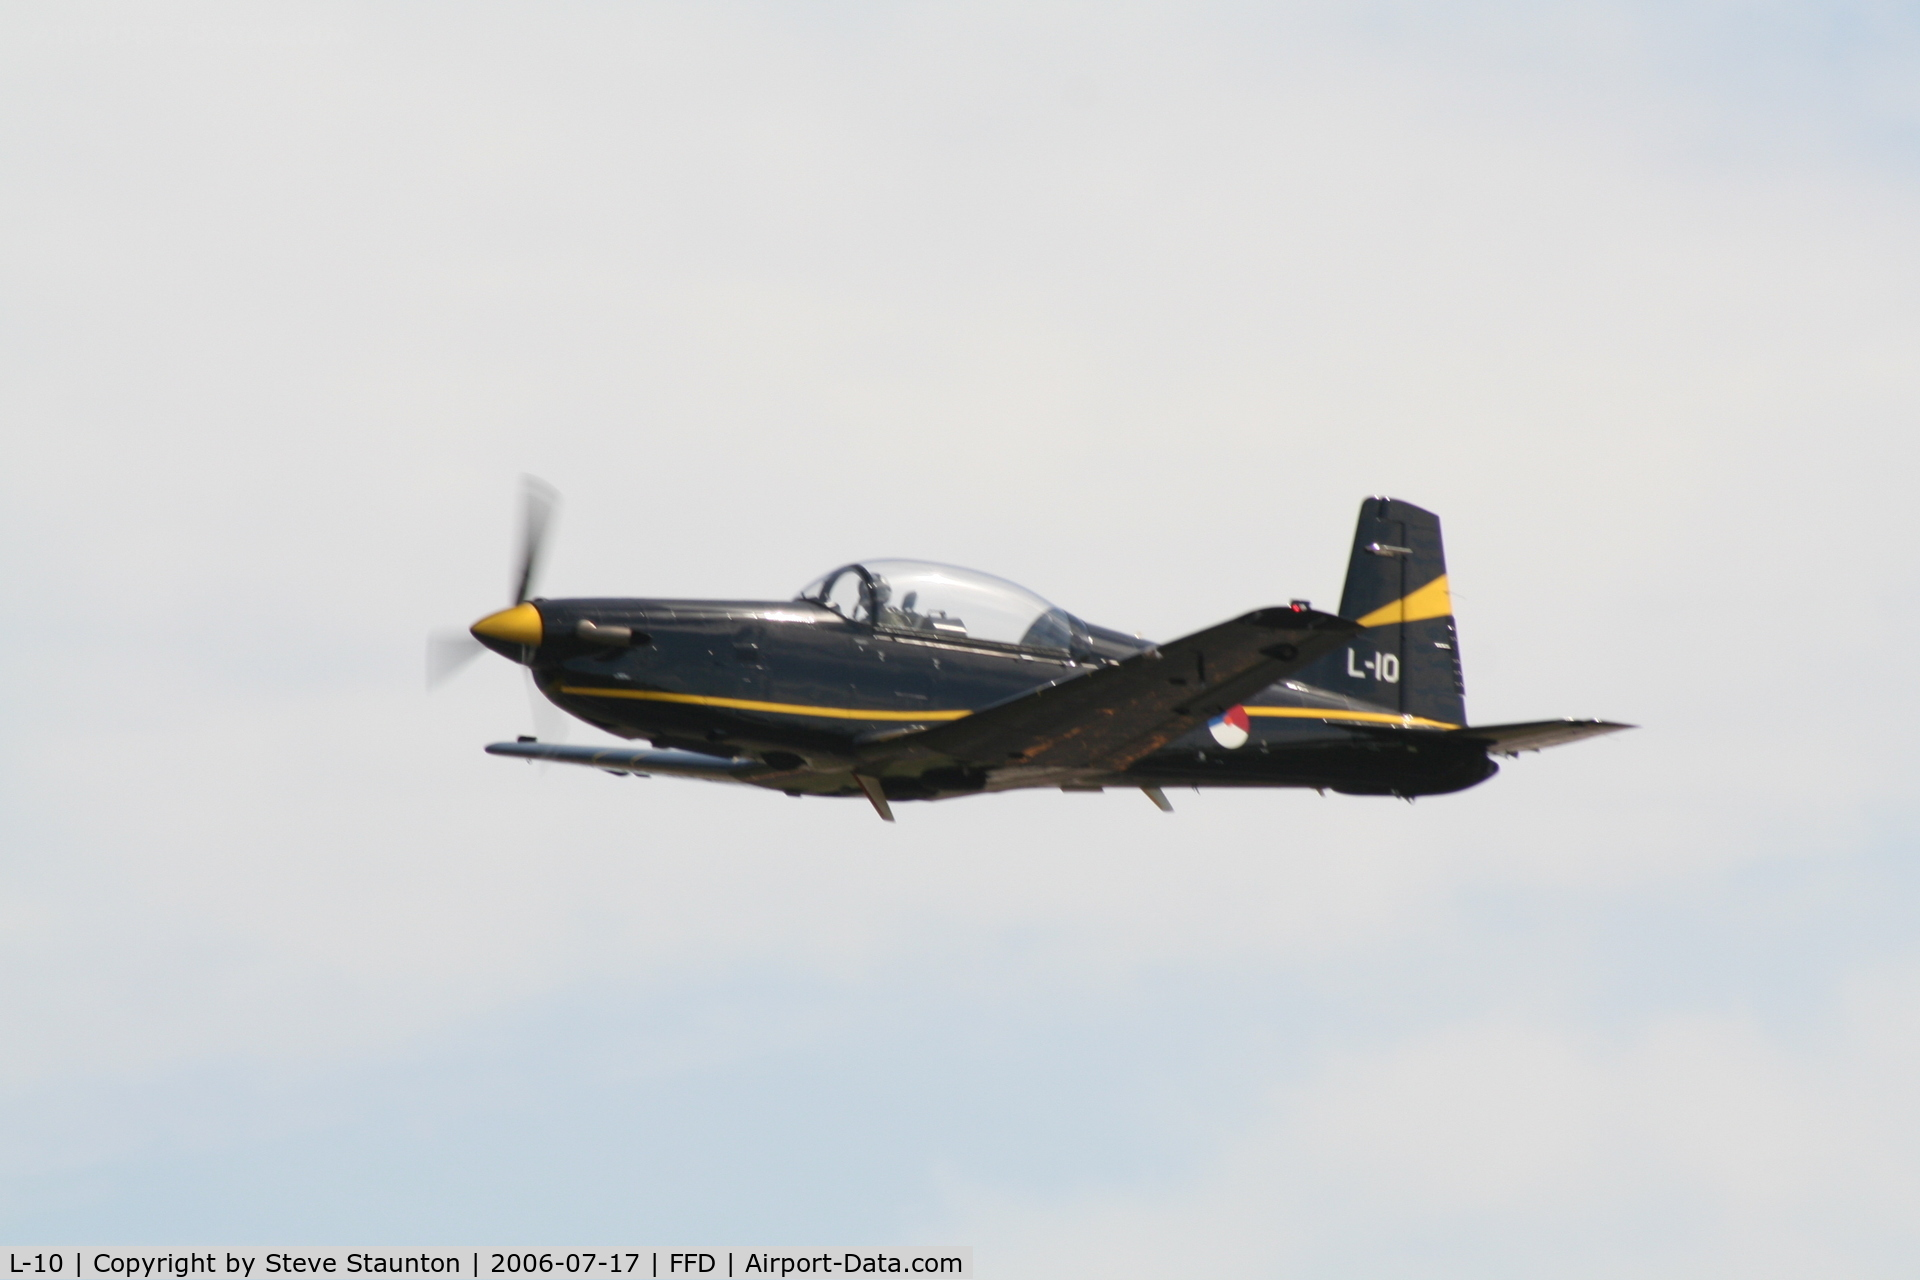 L-10, Pilatus PC-7 Turbo Trainer C/N 547, Royal International Air Tattoo 2006